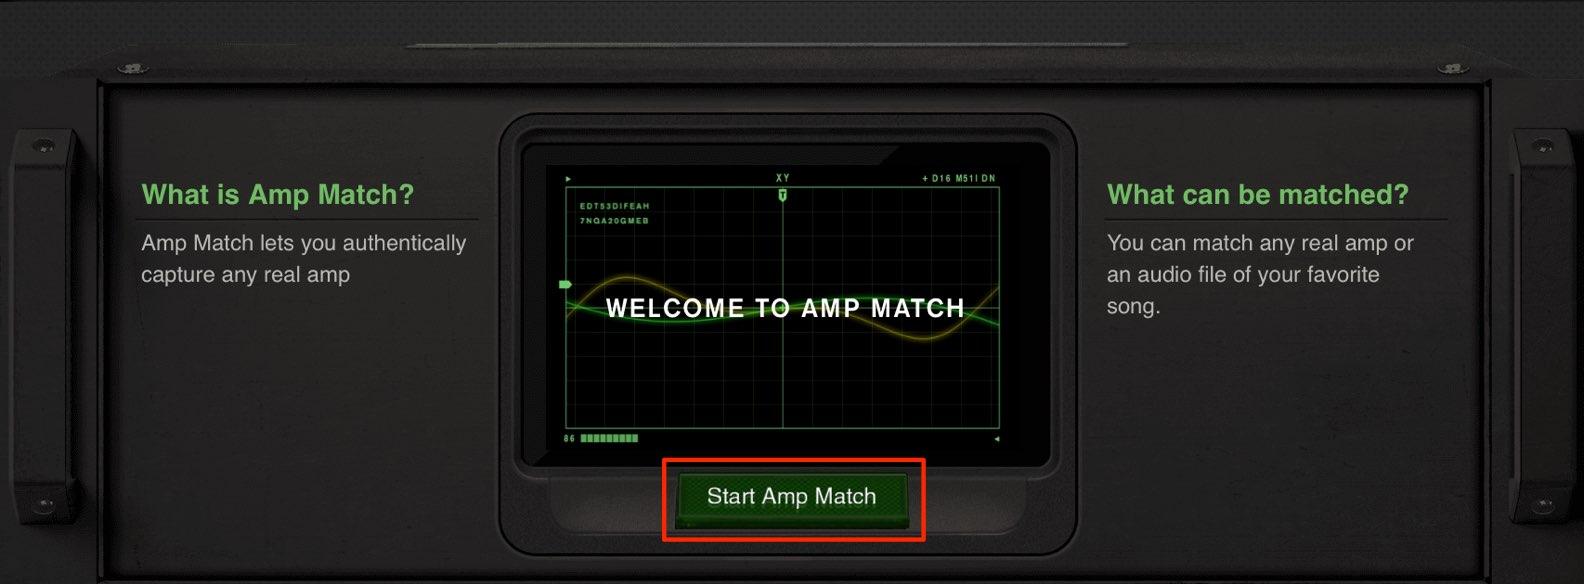 Start Amp Match